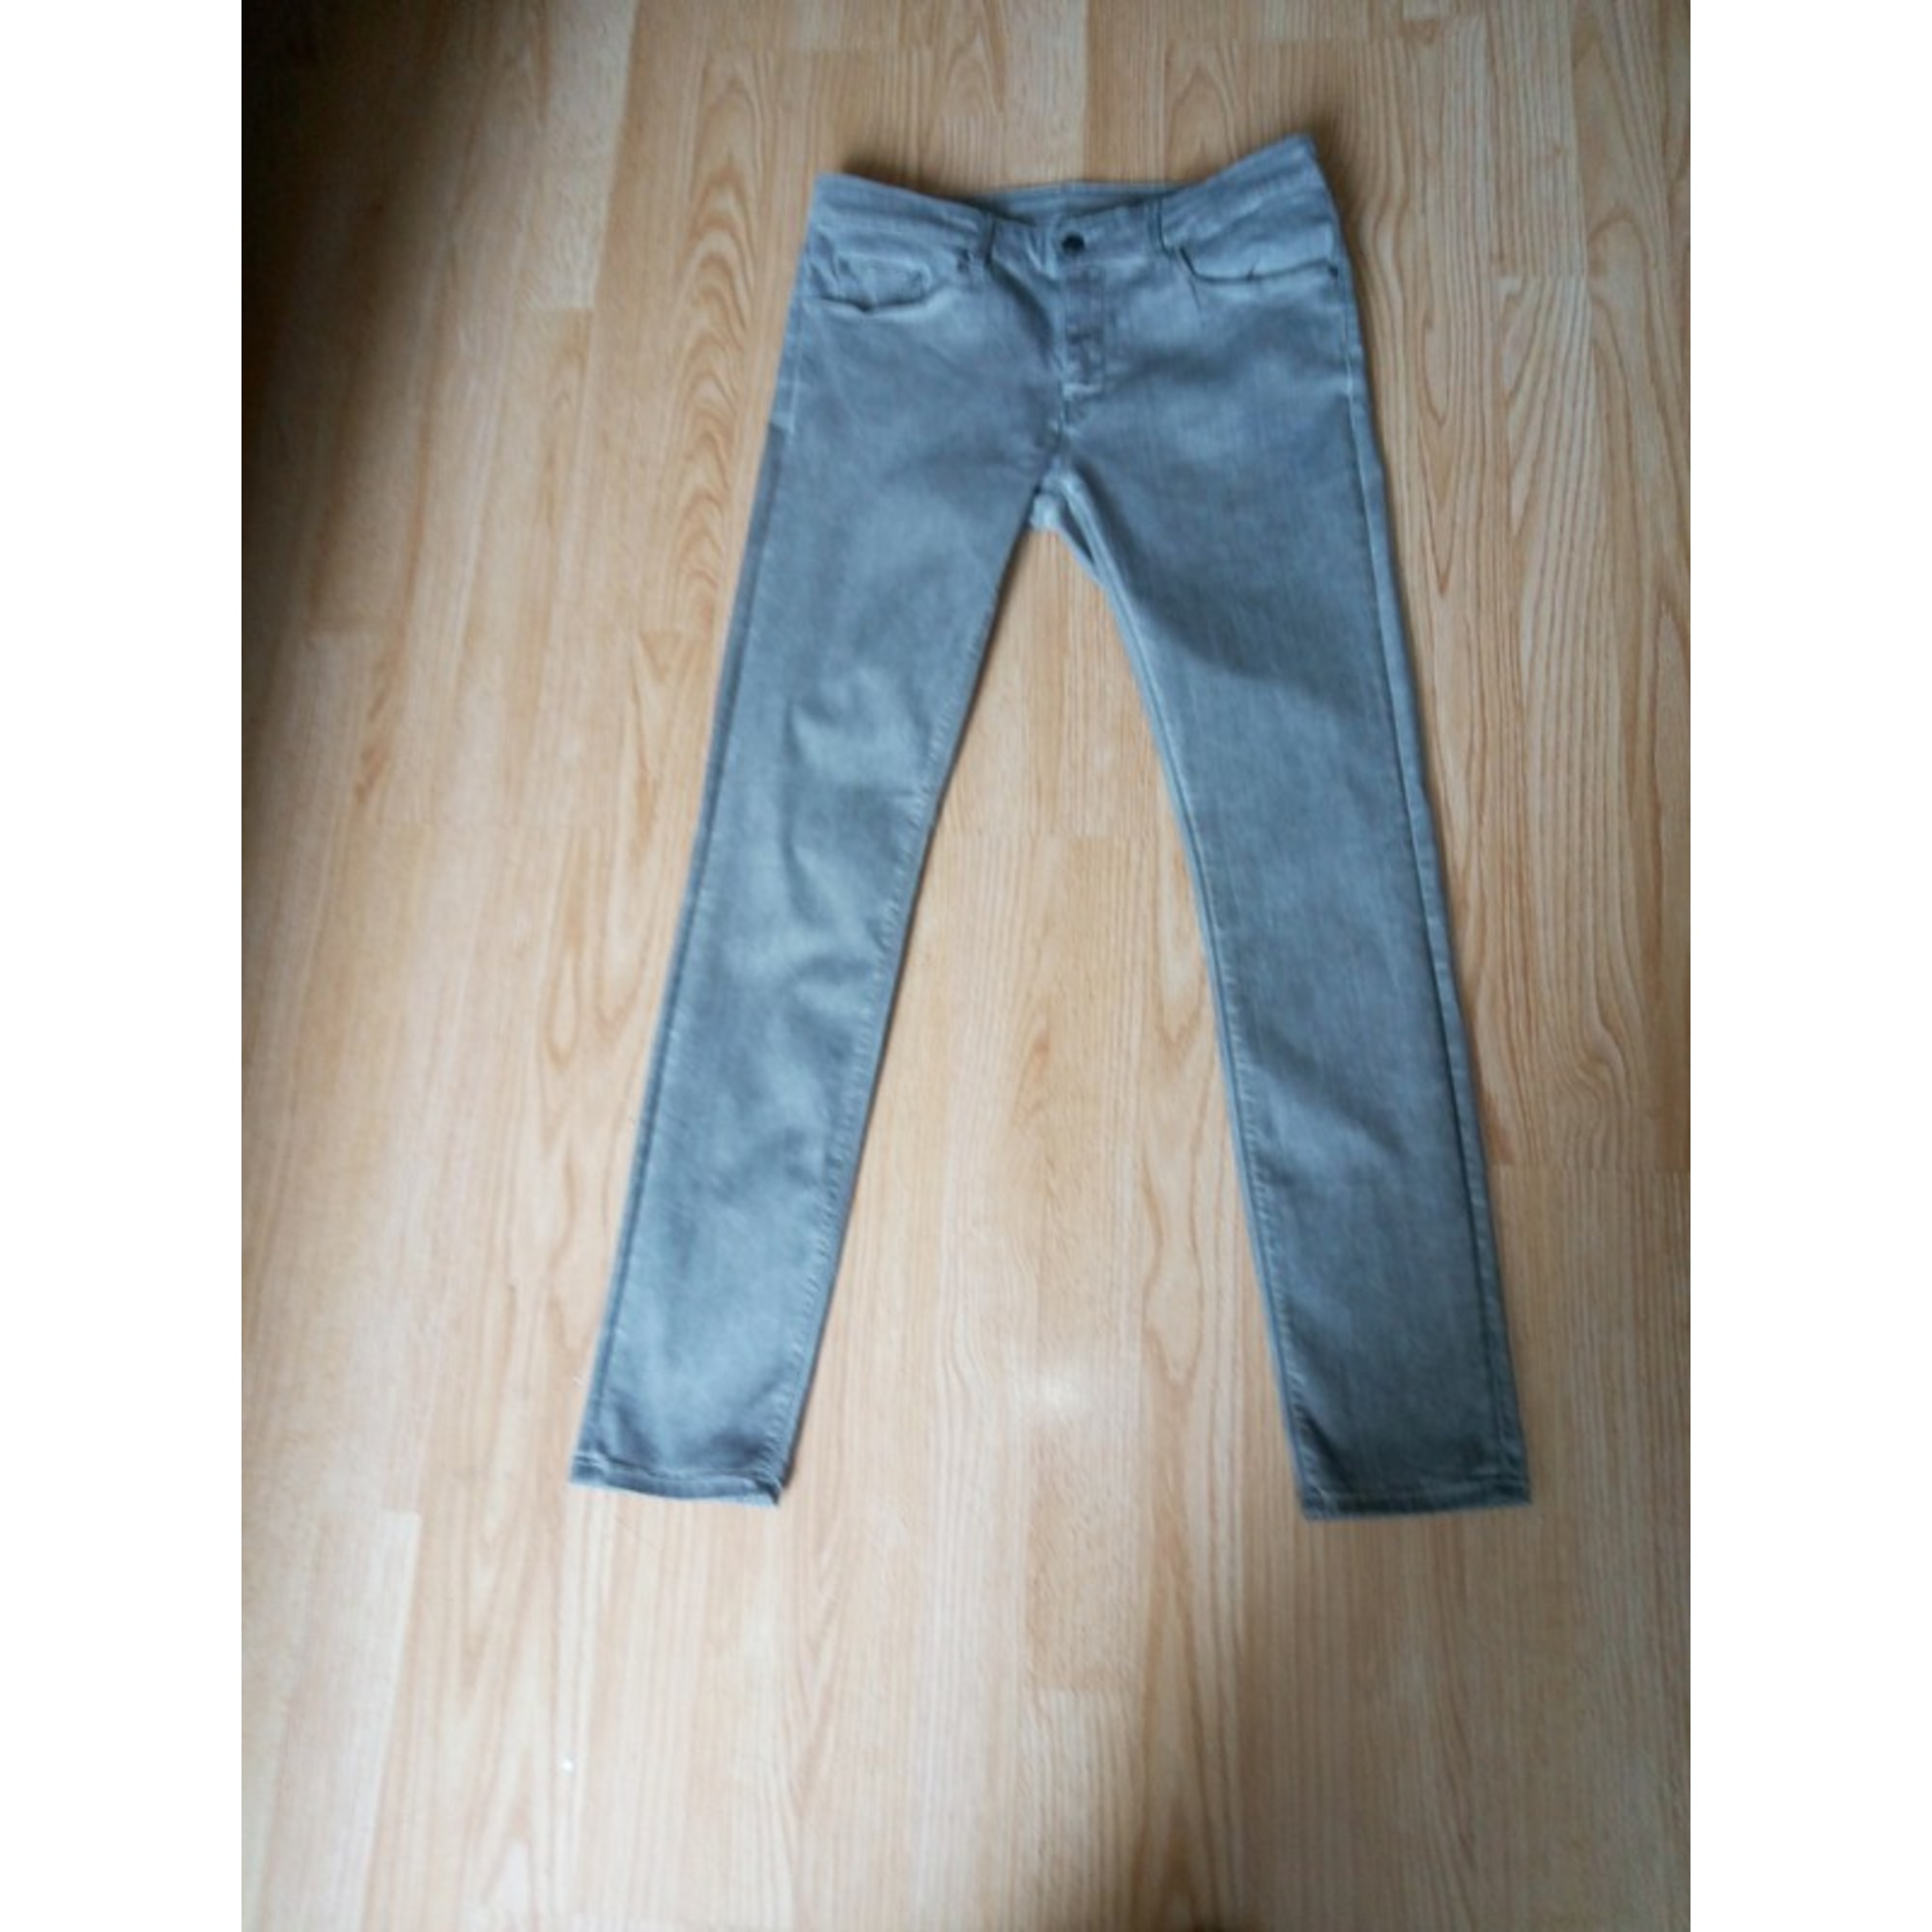 Jeans droit ZARA Gris, anthracite